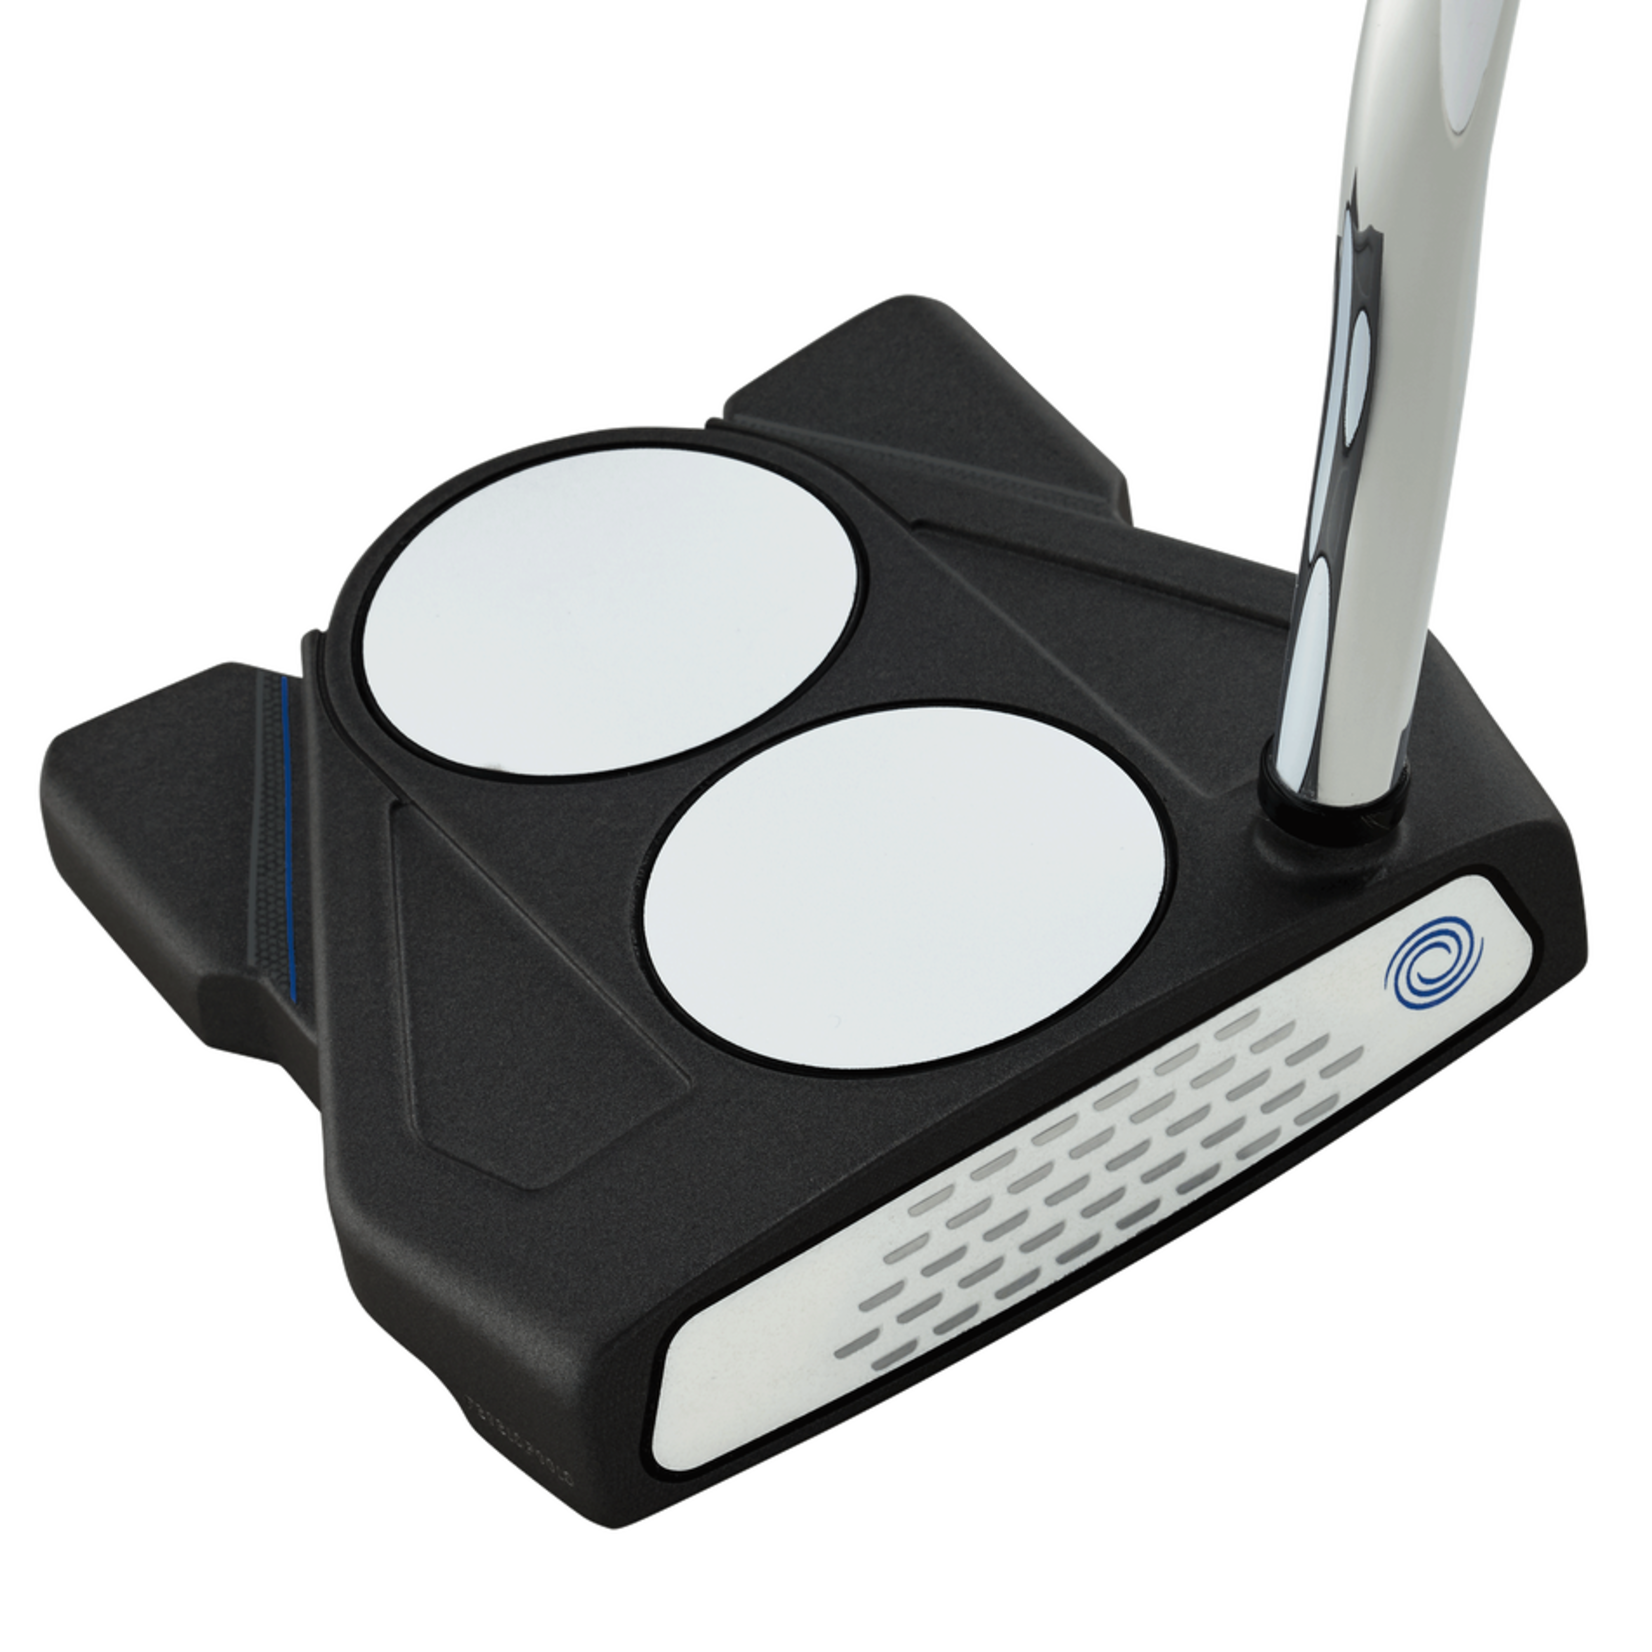 Odyssey Odyssey Stroke Lab Putter Ten 2Ball OS '20